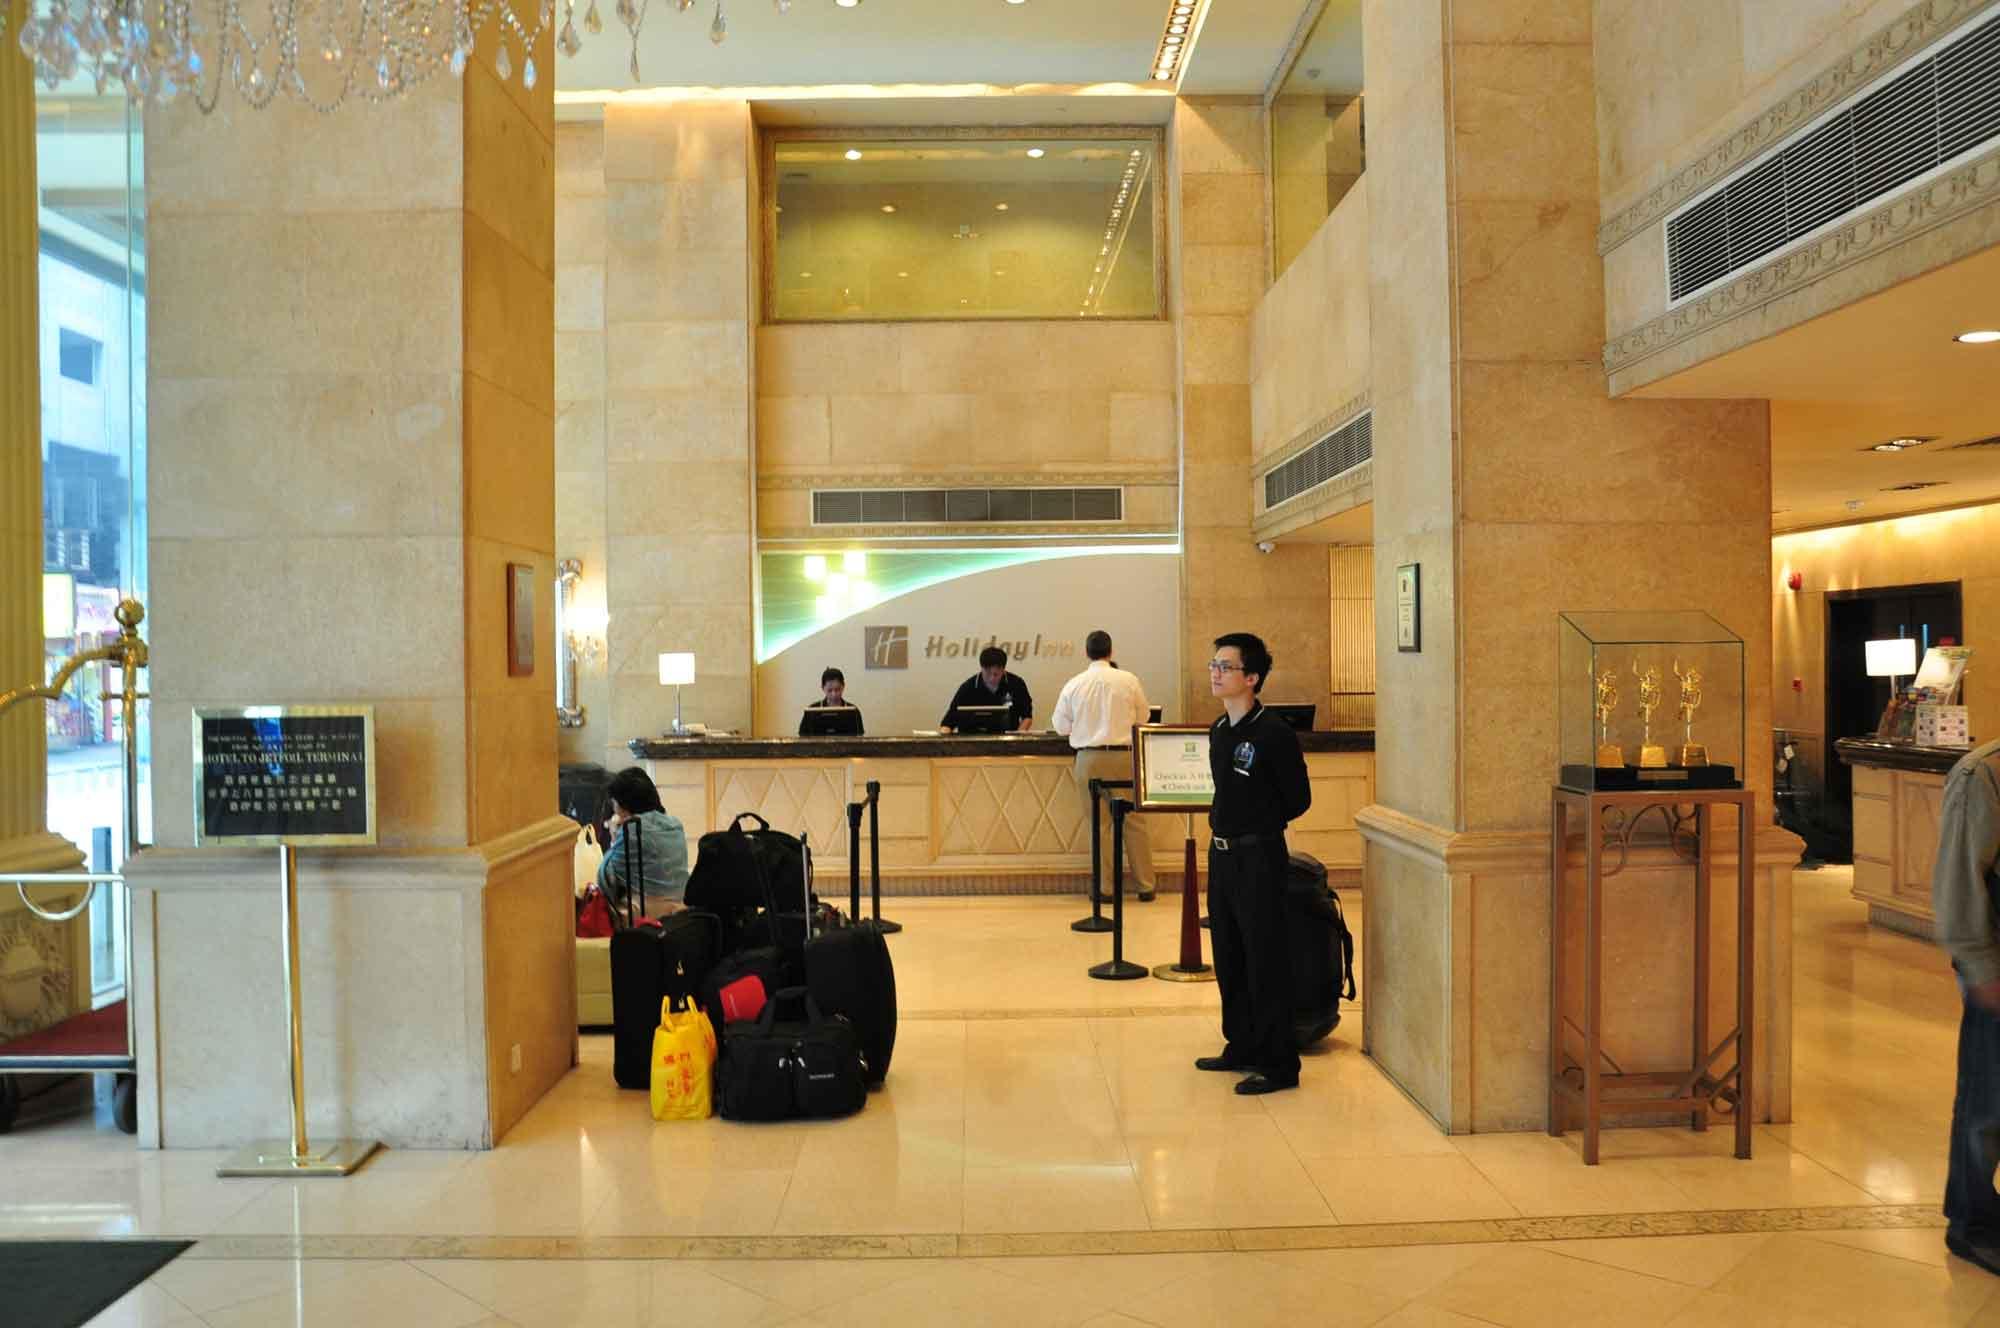 Holiday Inn Macau front desk